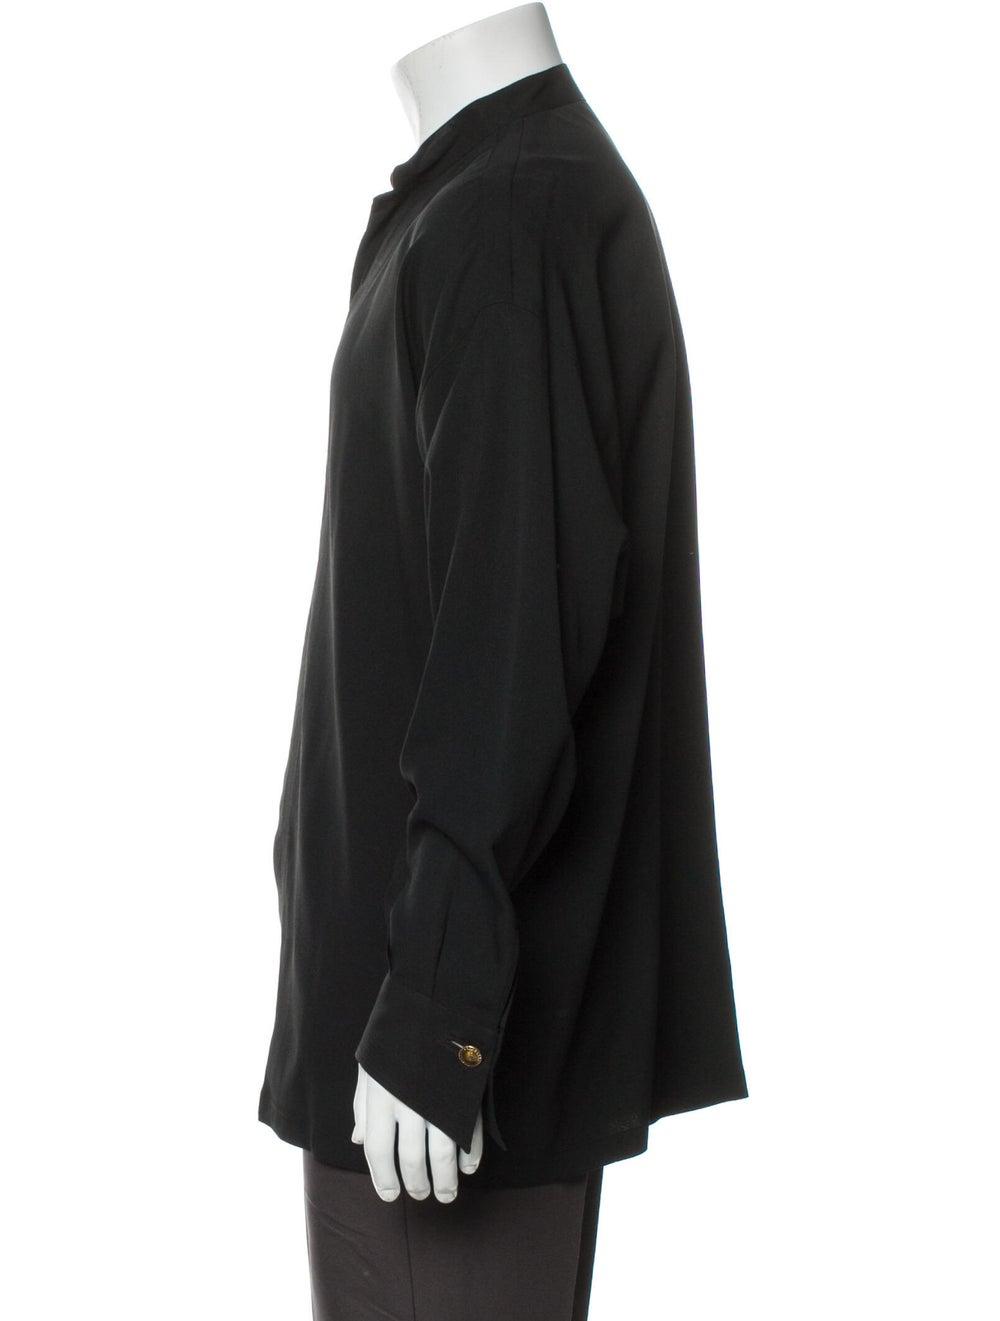 Gianni Versace Vintage 1990's Shirt Black - image 2